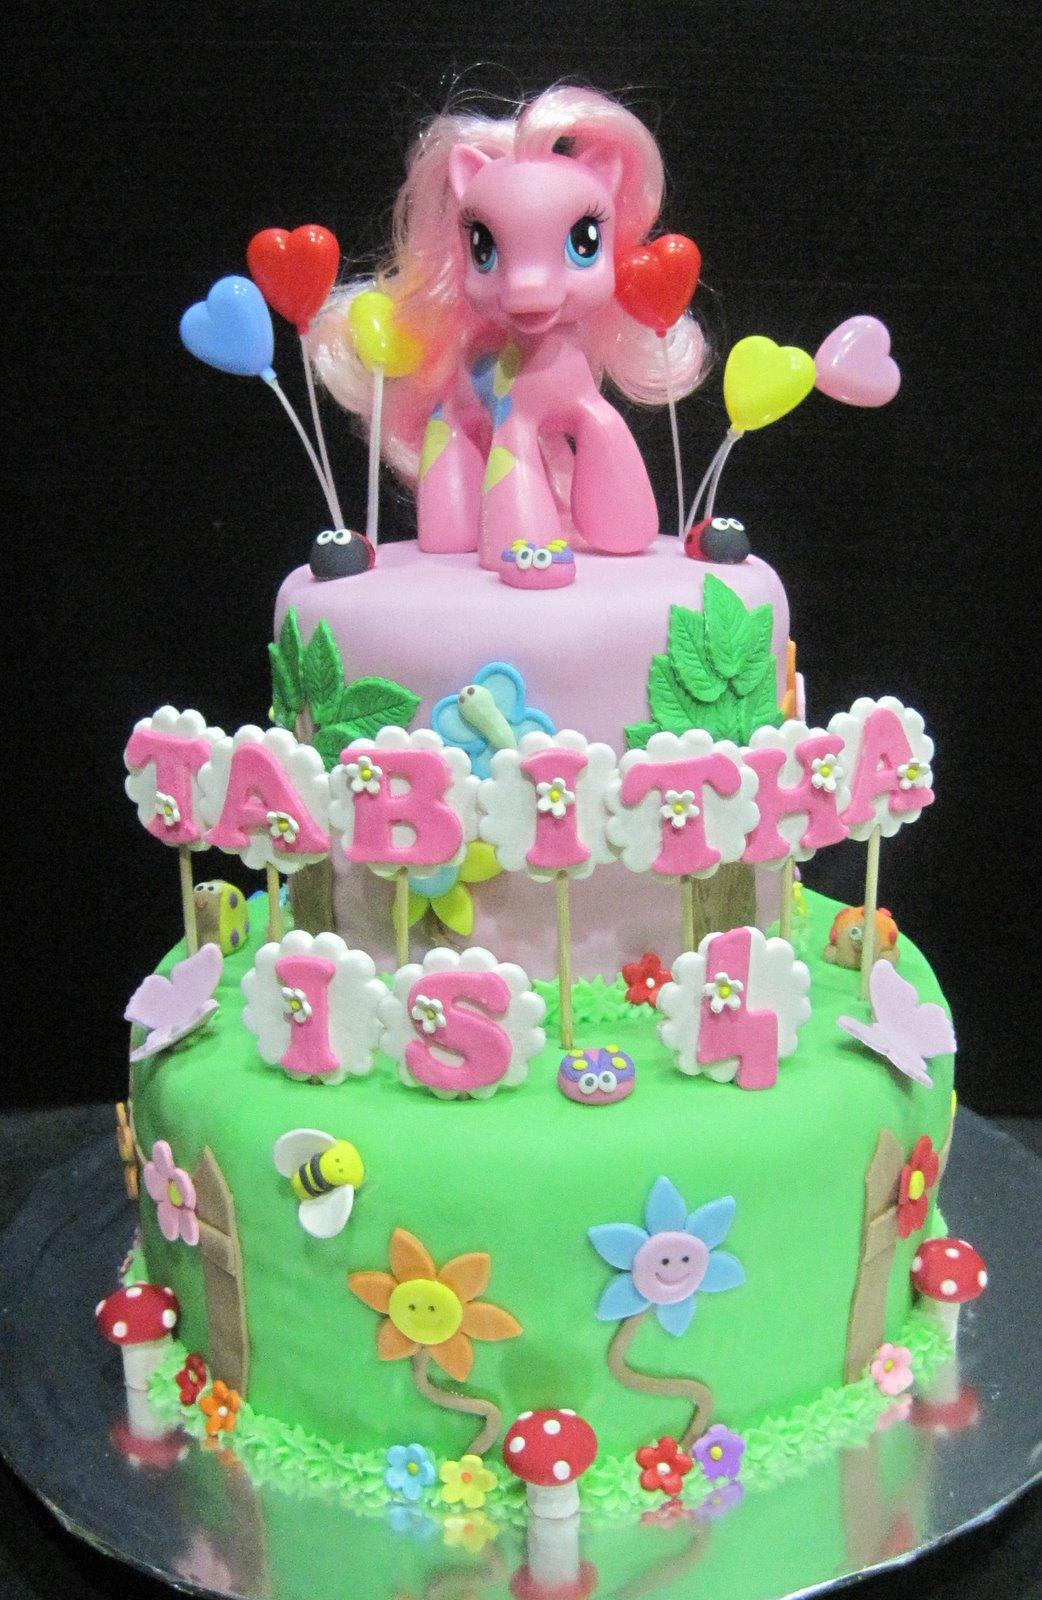 Cupcake Divinity: My Little Pony Cake